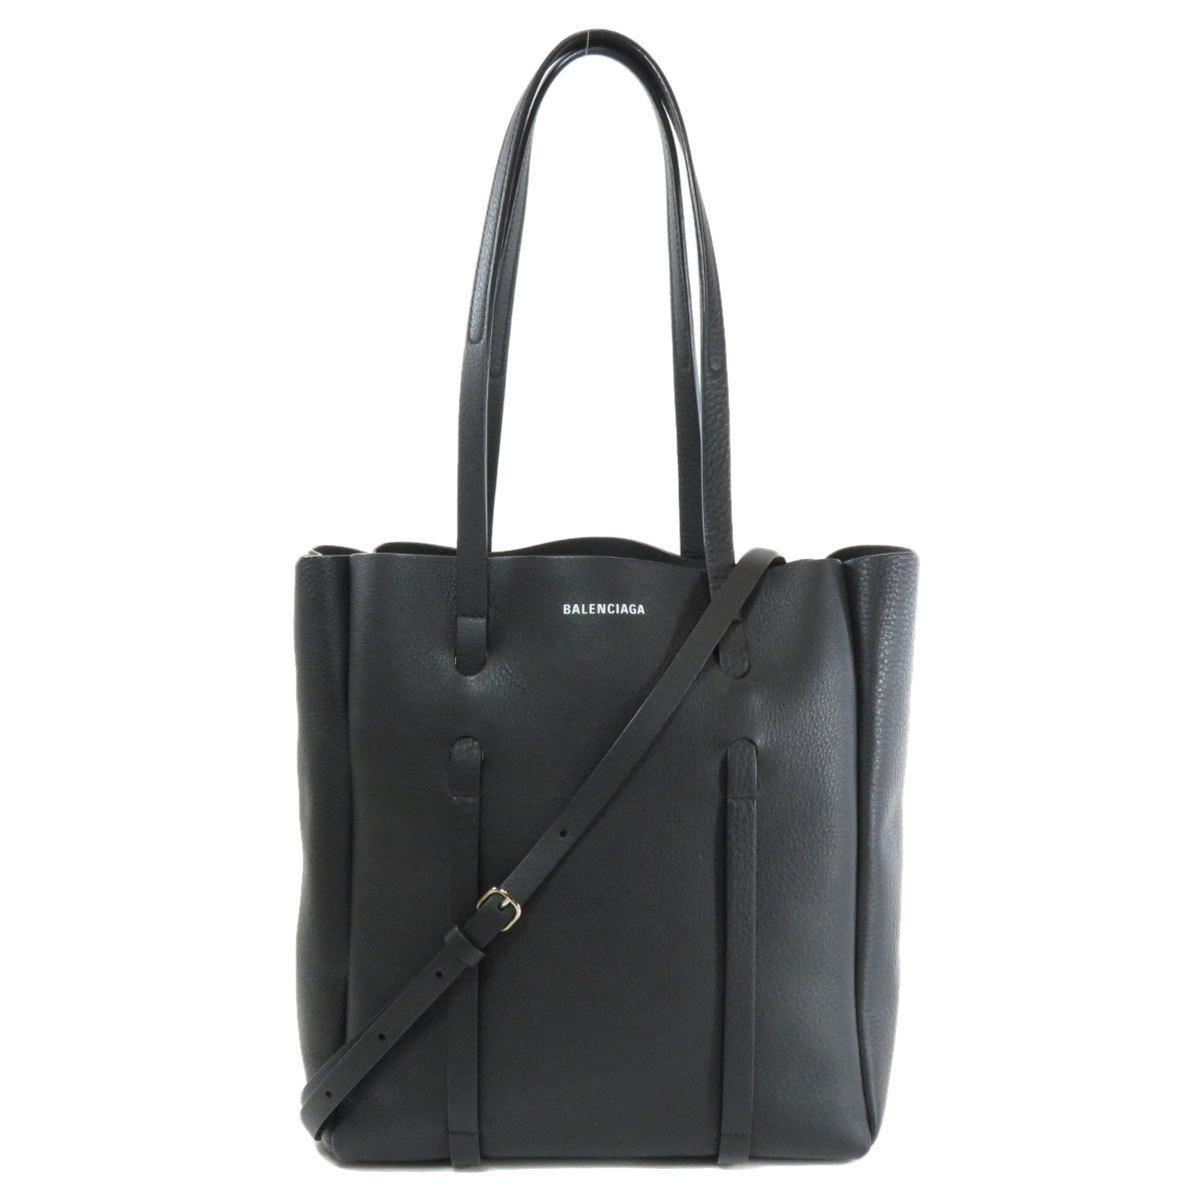 Balenciaga 489813 Everyday Tote S 2WAY Bag Leather Ladies